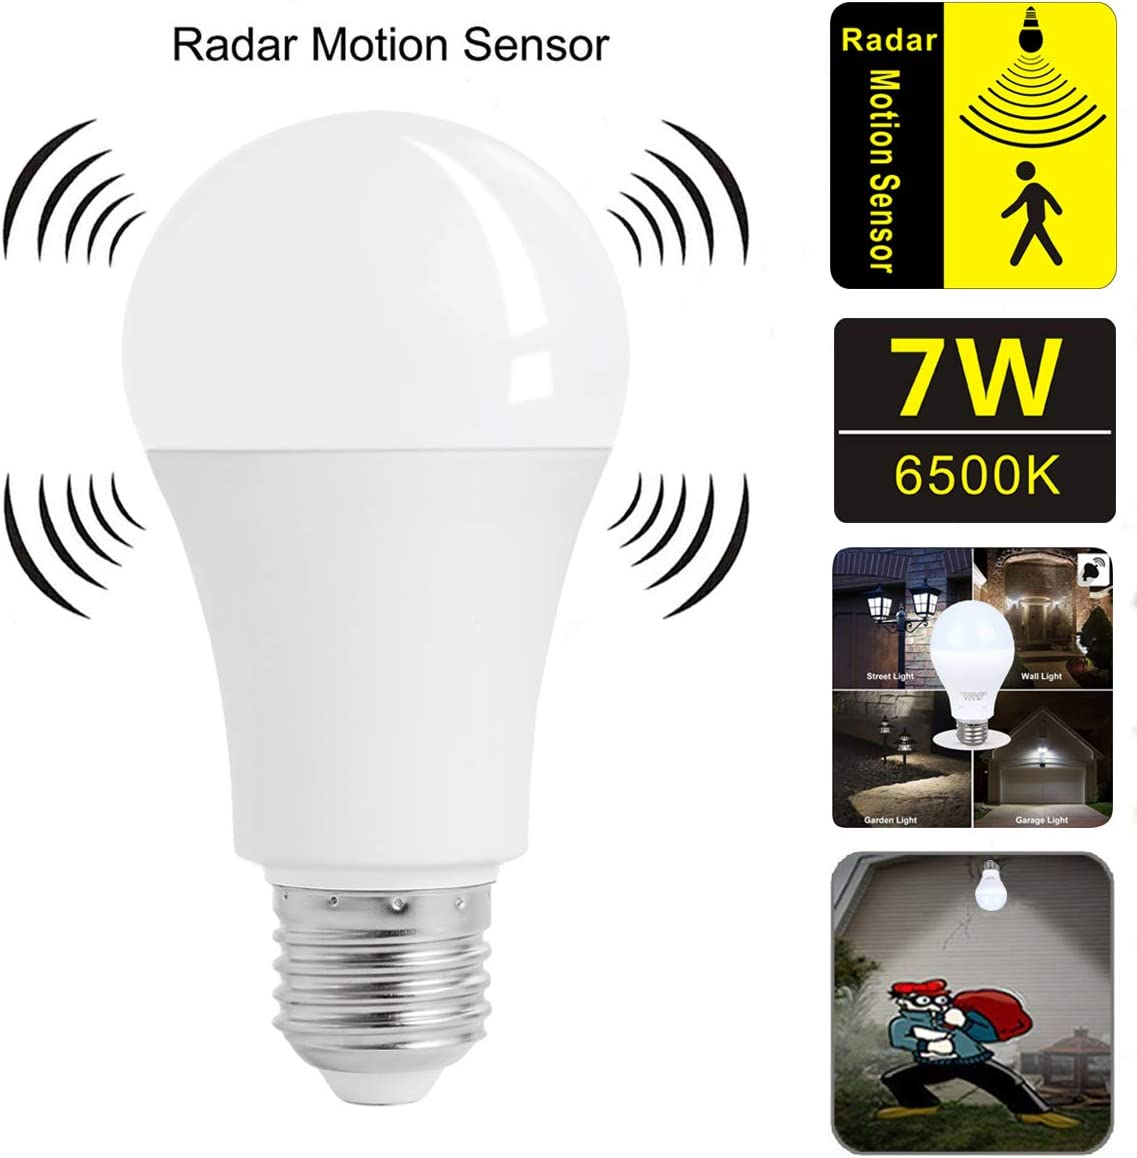 Motion Sensor Light Bulb,7W Smart Bulb Dusk to Dawn,E26 Base Indoor,Radar Motion Sensor Light Bulbs, White 6500K Outdoor Motion Sensor Bulbs Auto On/Off by aijiaer